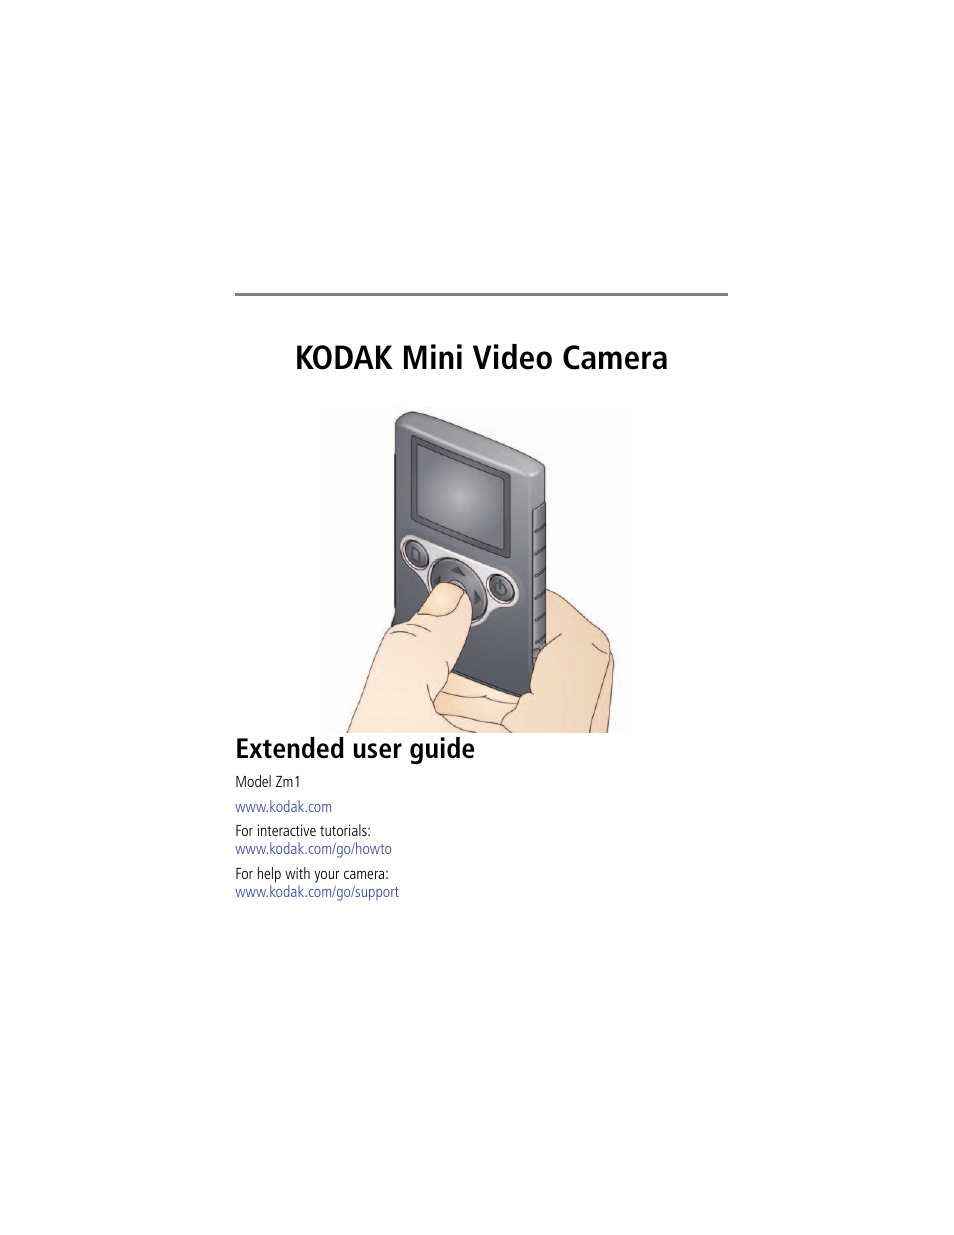 kodak zm1 user manual 26 pages rh manualsdir com Kodak Mini Video Camera Driver Charge Kodak Mini Video Camera